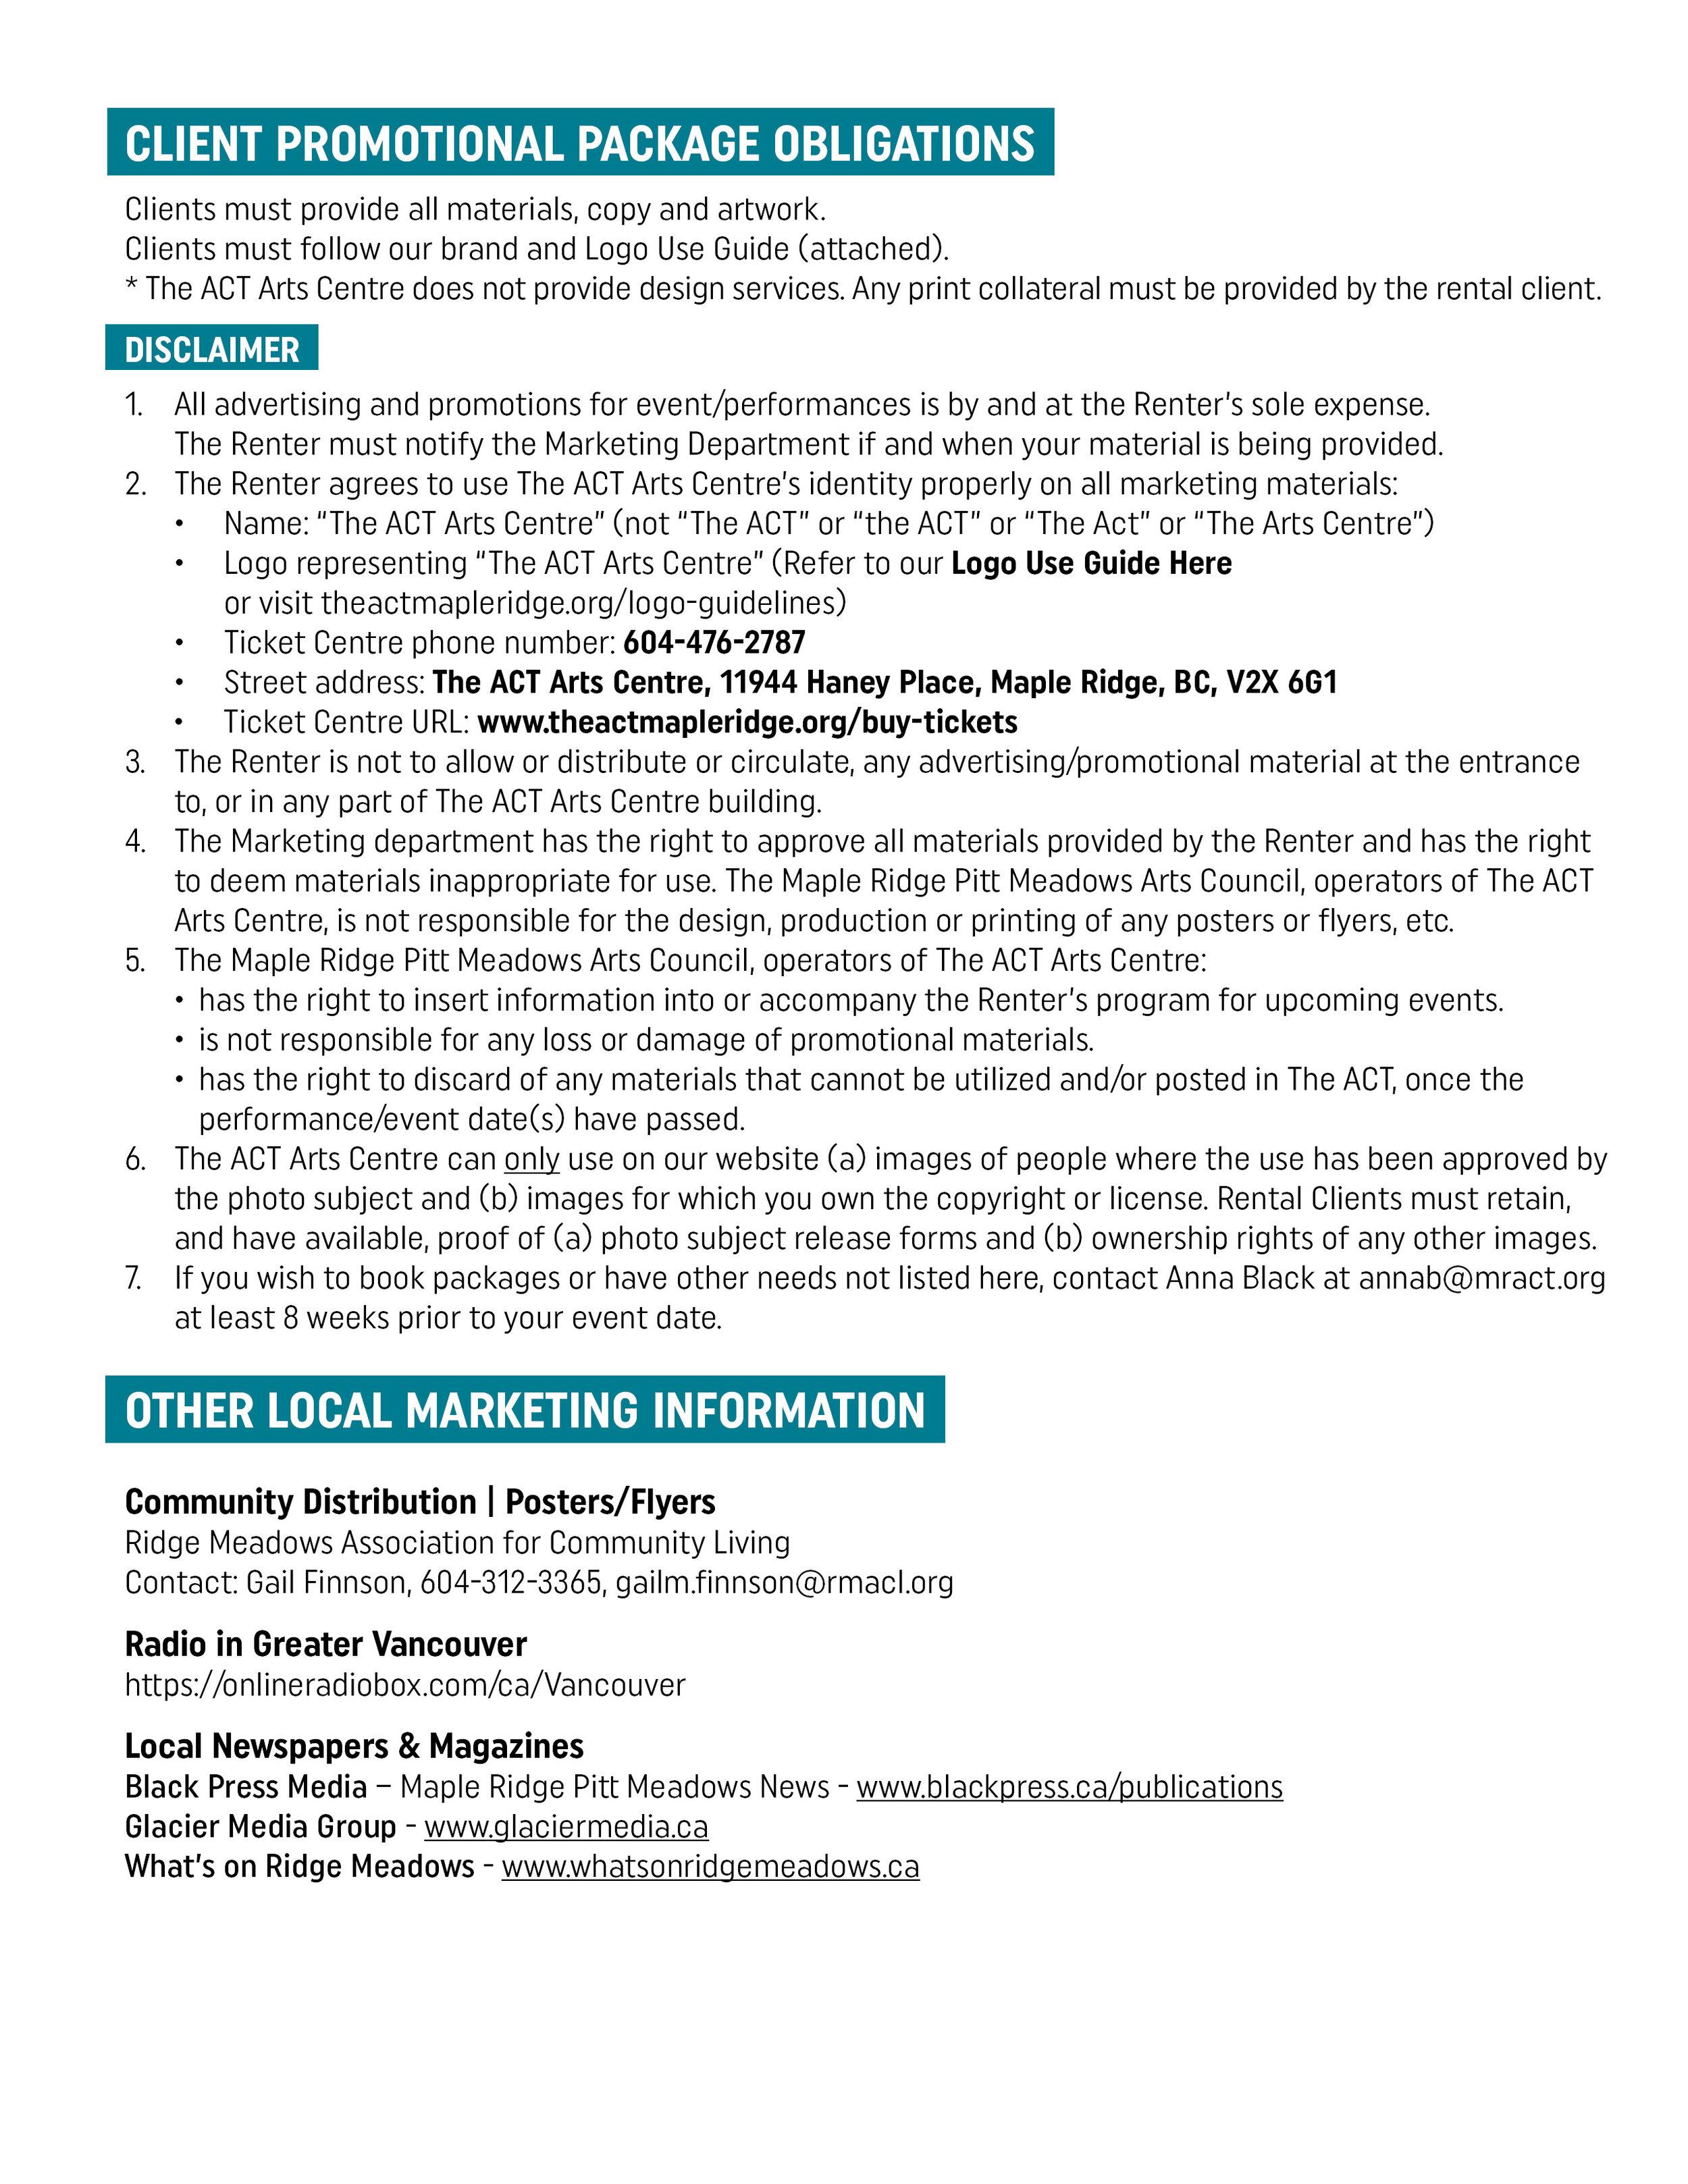 Rental Clients Promotional Package2.jpg